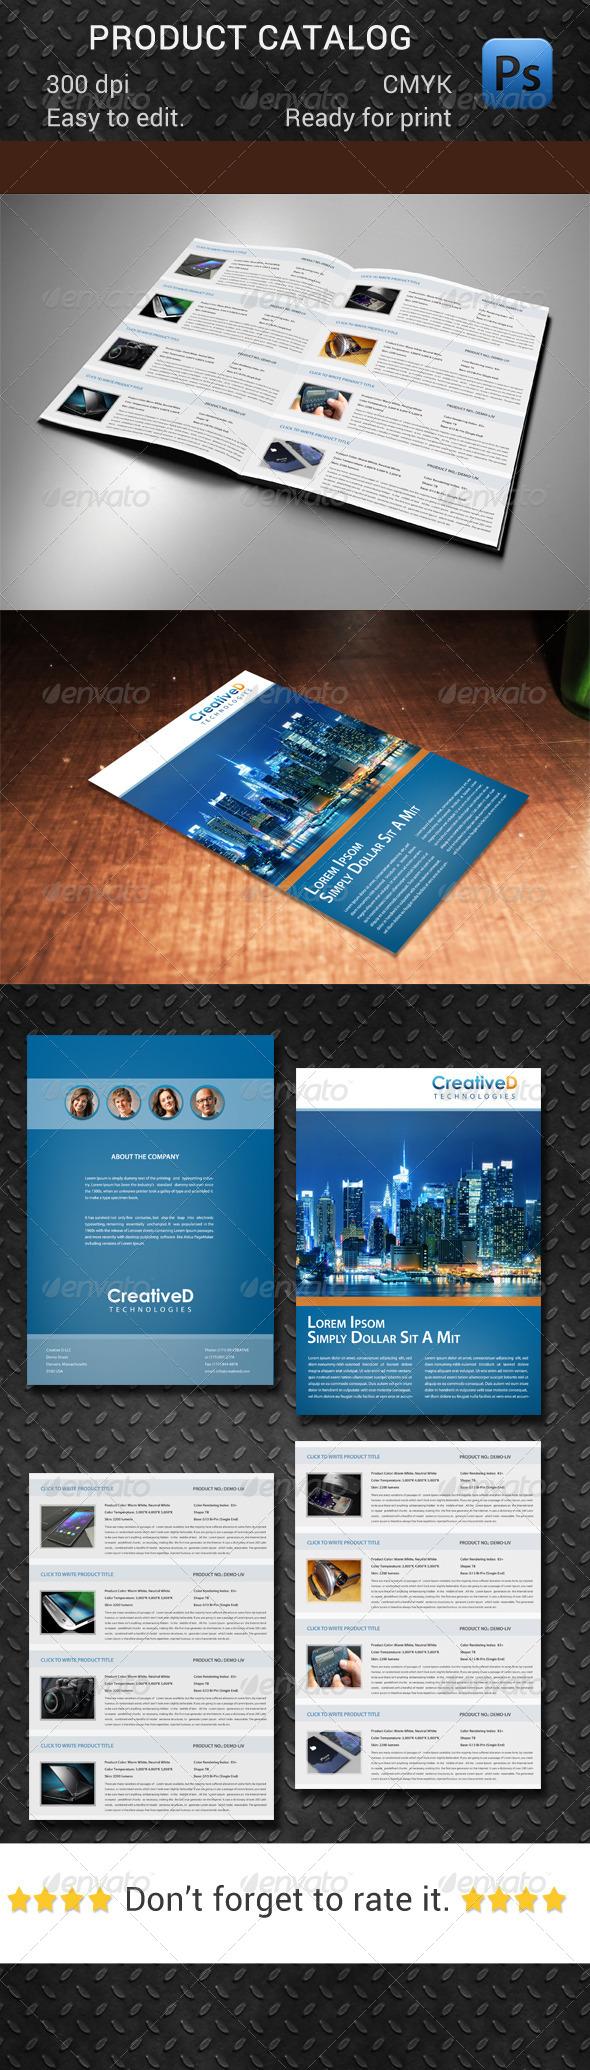 GraphicRiver Product Catalog 7762237